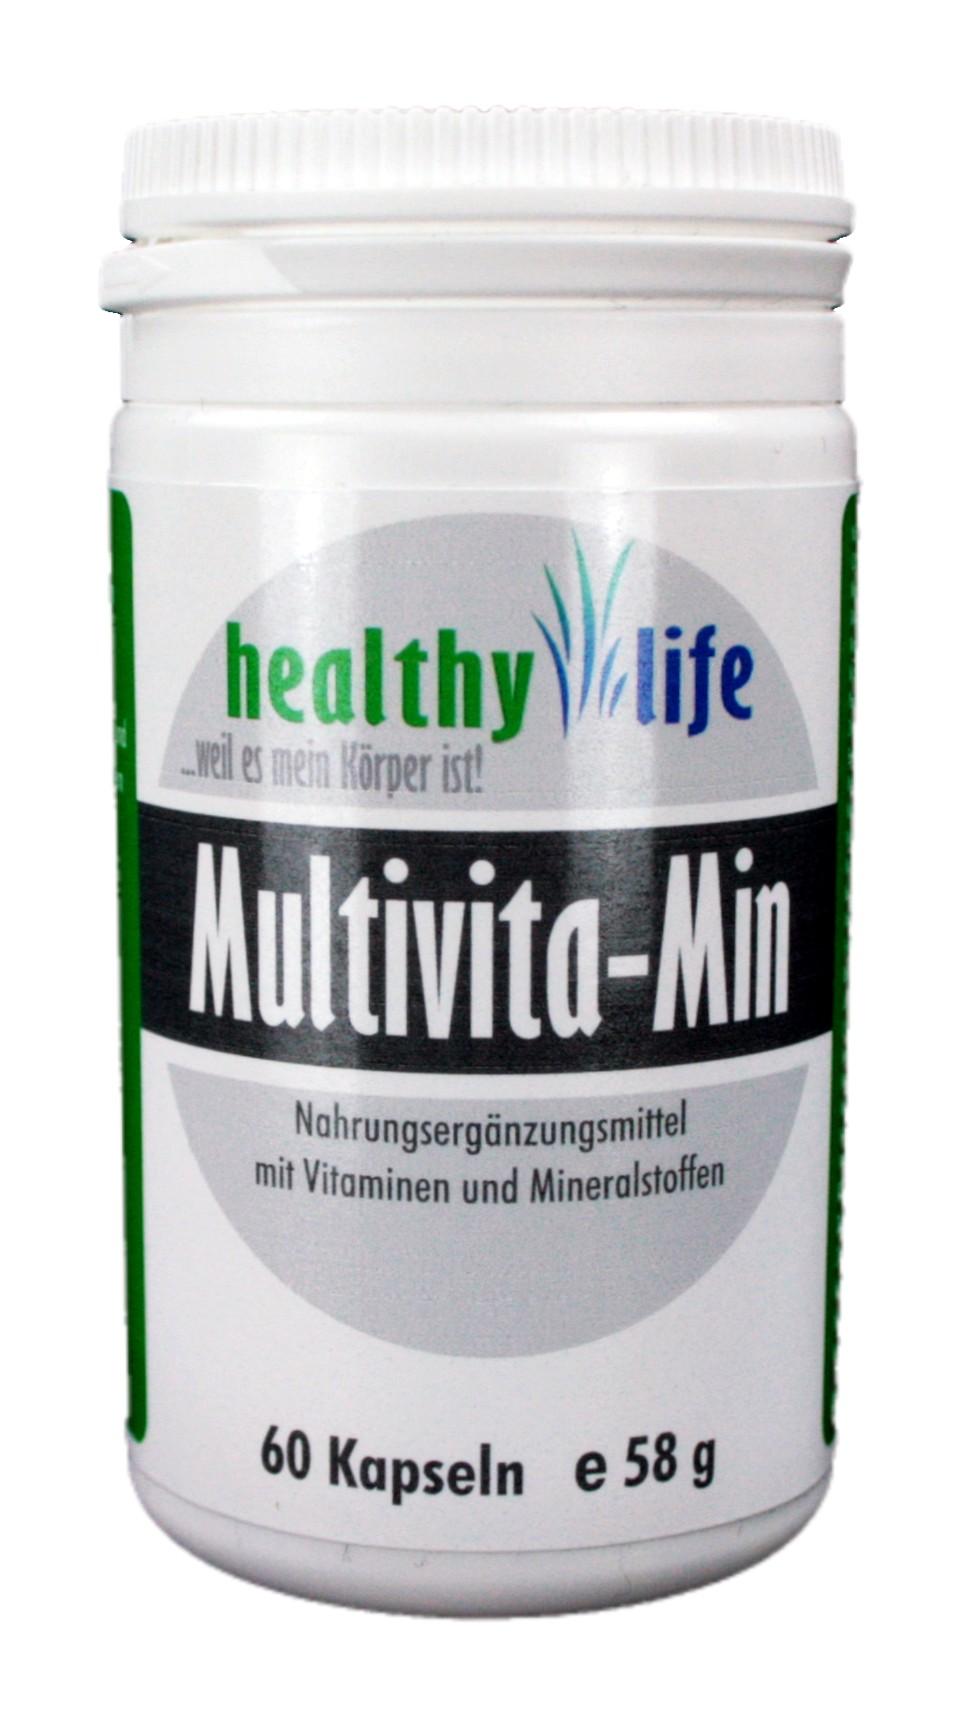 "Multivita-Min"" 60 Kapseln e 58g - Cosmos Bodystyling"